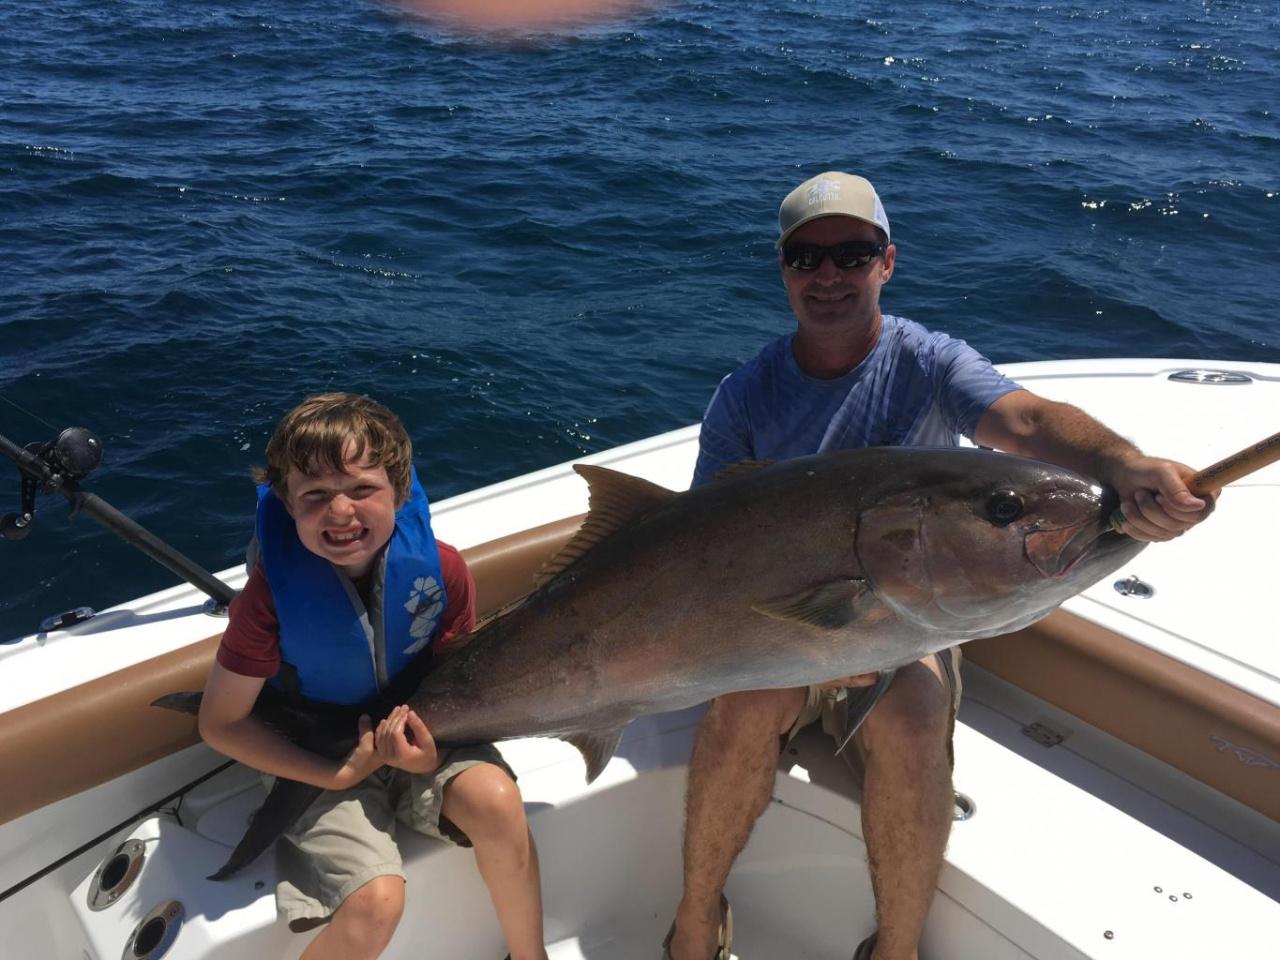 Been a great summer of fishing-06deb4d5-f065-4f8a-afc6-de94c6118fd4_1534731451495-jpg